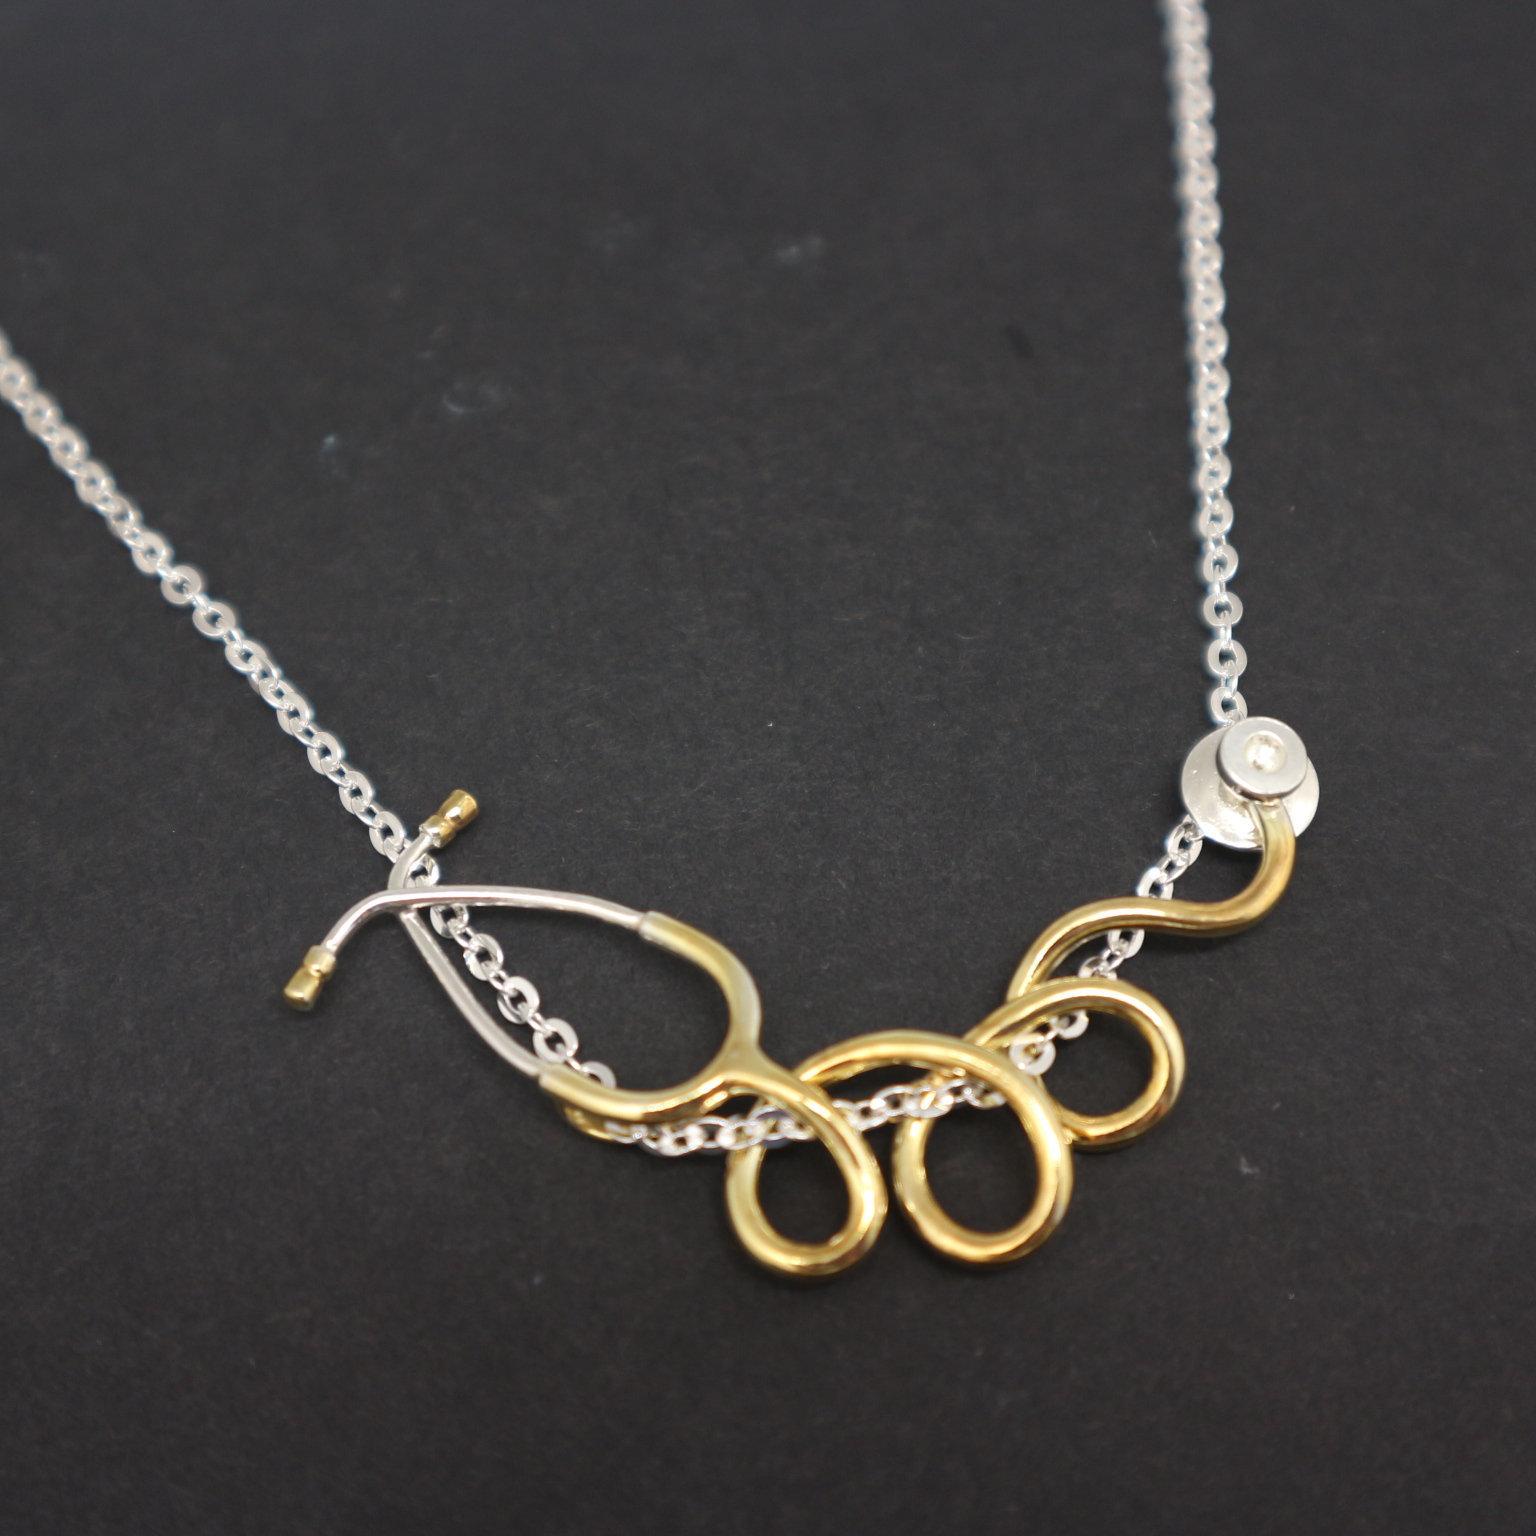 Silver Stethoscope Nurse Necklace